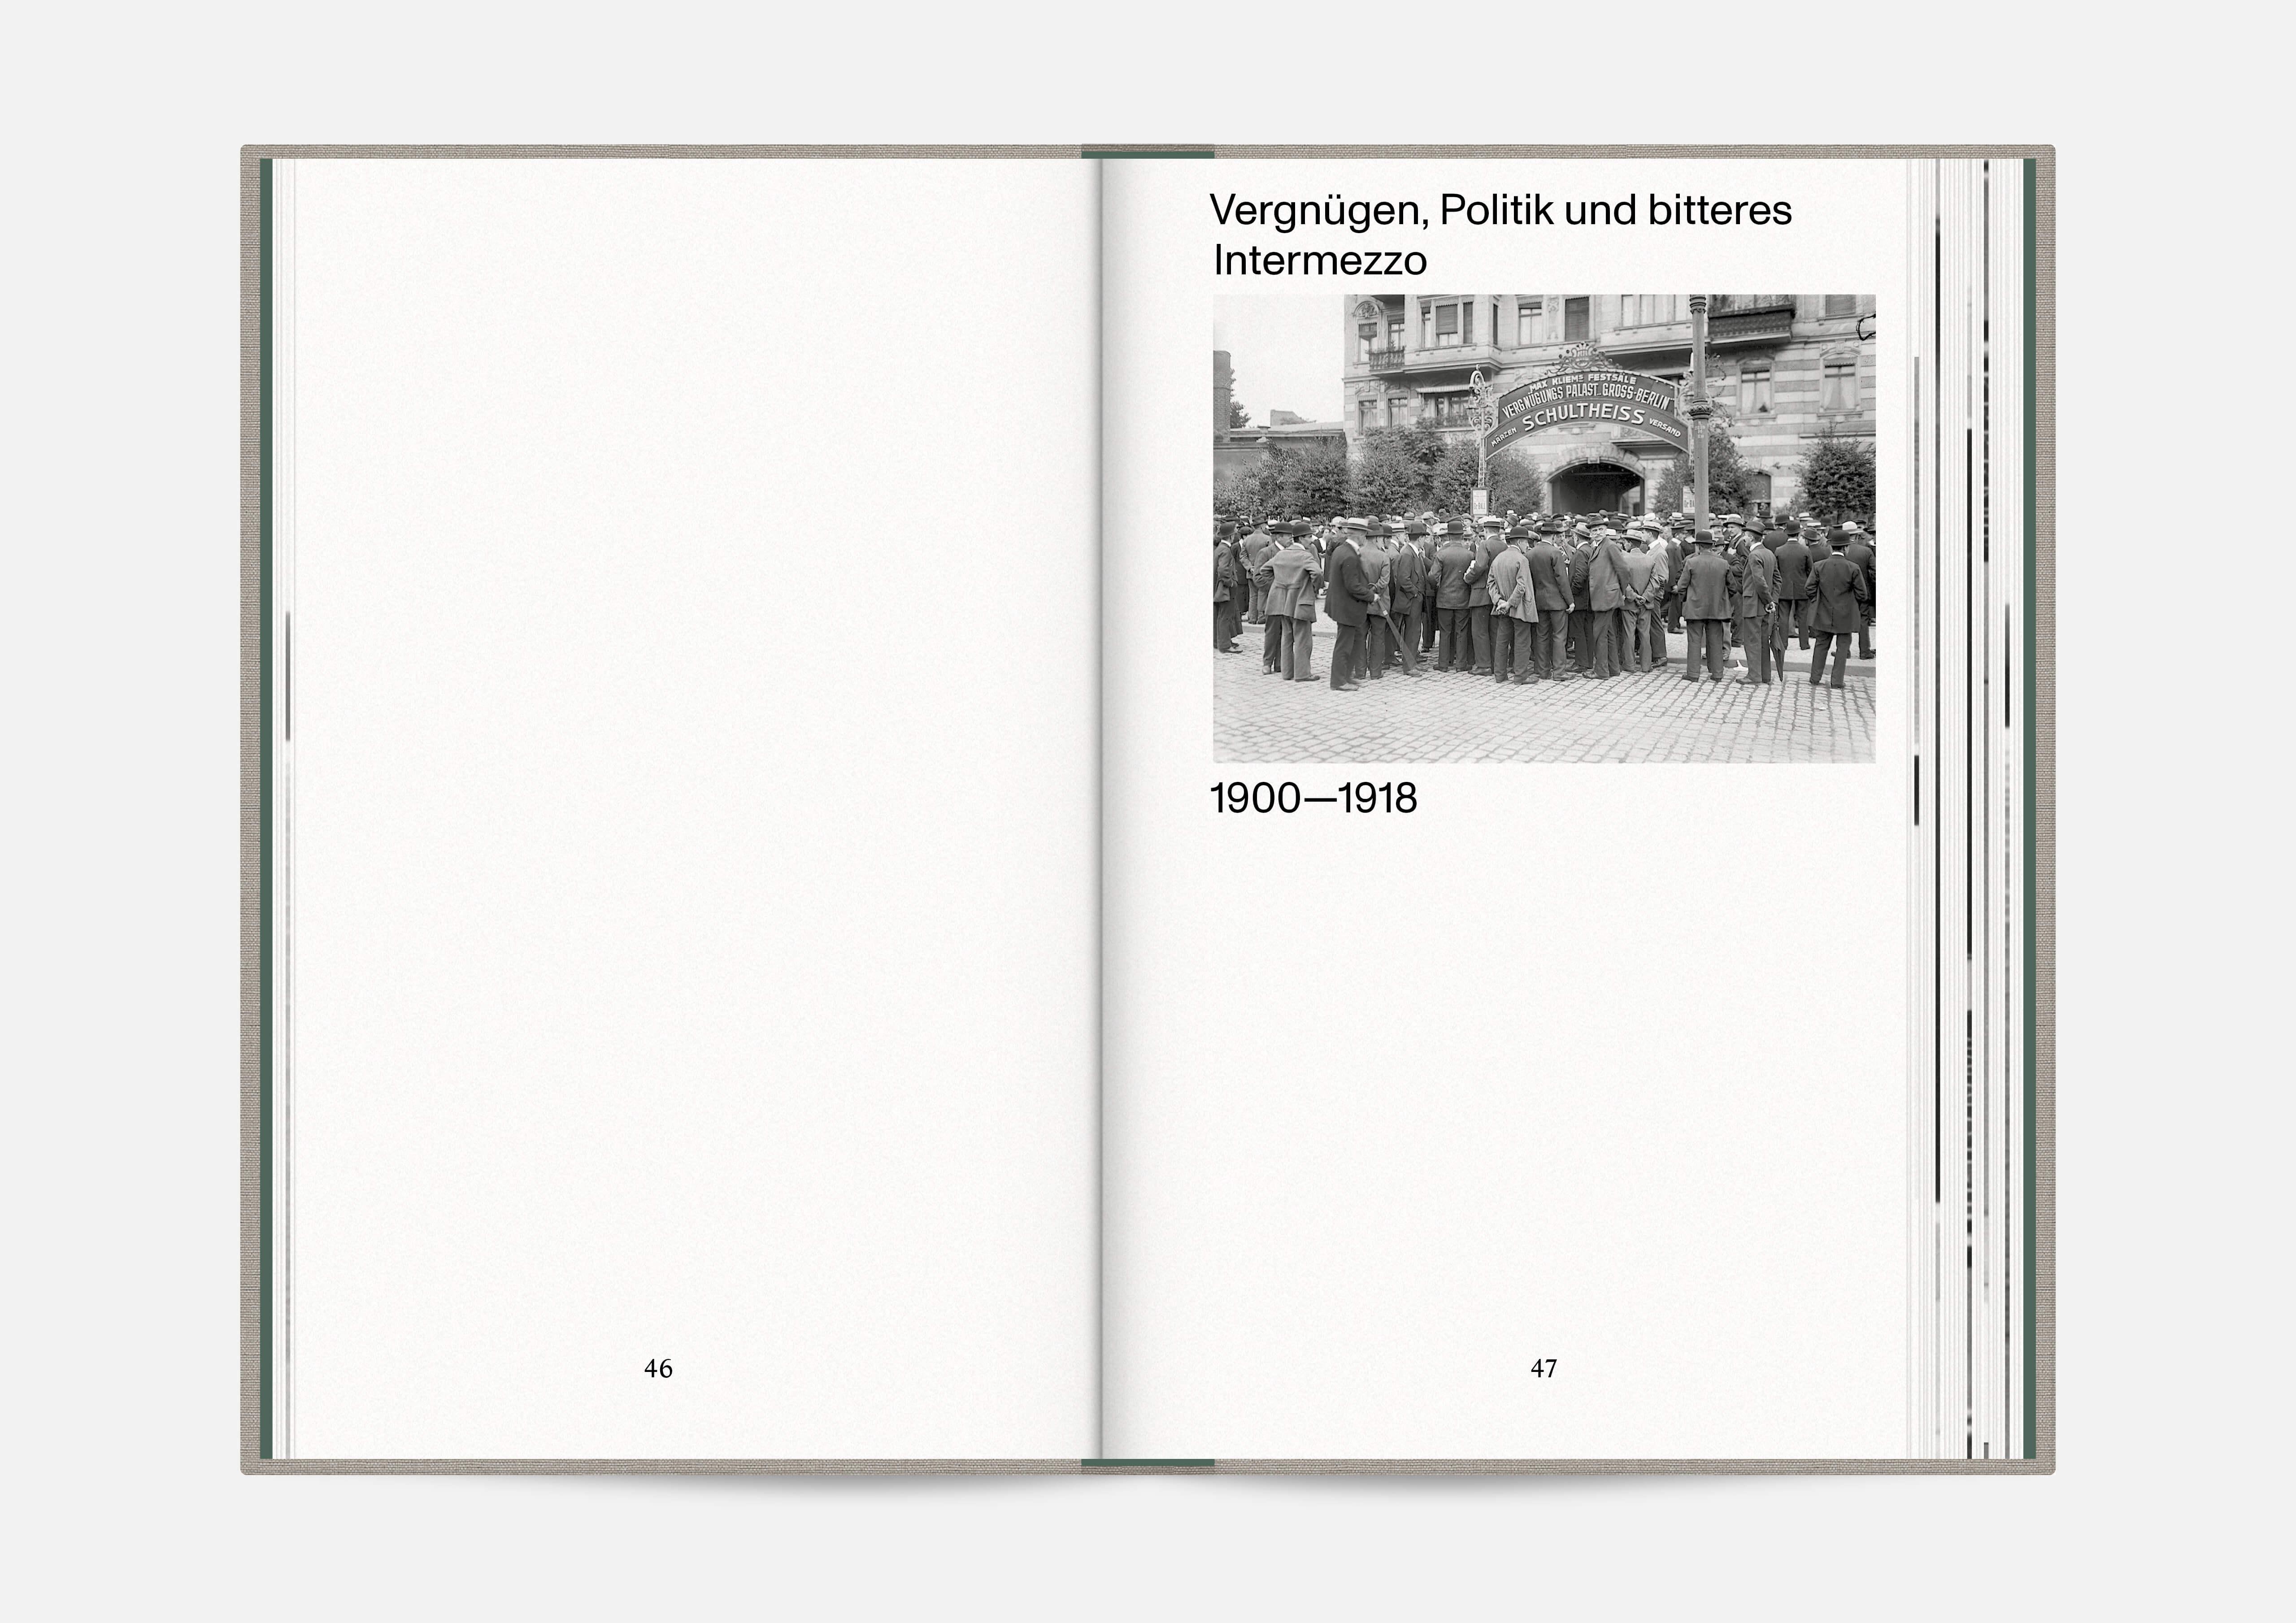 https://neuegestaltung.de/media/pages/clients/sammlung-wemhoner-hasenheide-13/9fdbef50dd-1628761380/sw-hasenheide_13.jpg